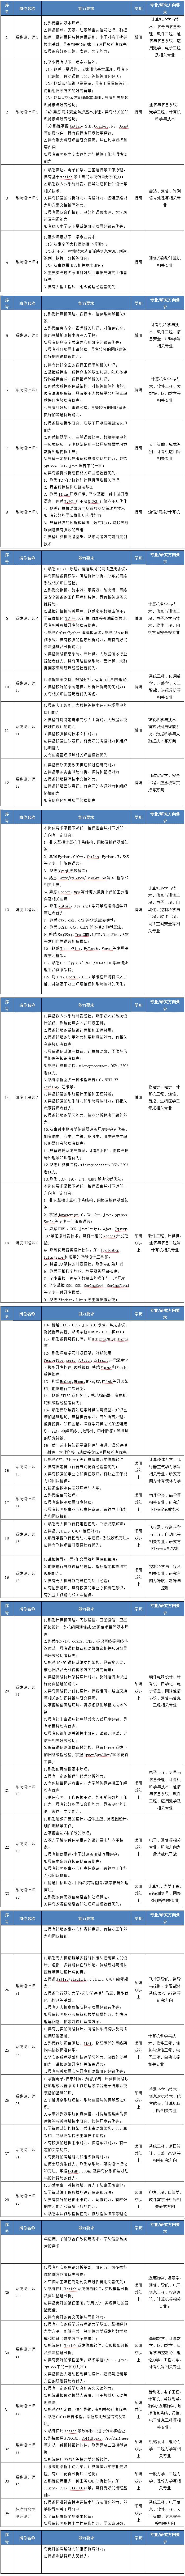 http://bbs.xiaoyuanshenghuo.com.cn/data/attachment/forum/201910/09/205108bb4pz9d5alo7lb77.png